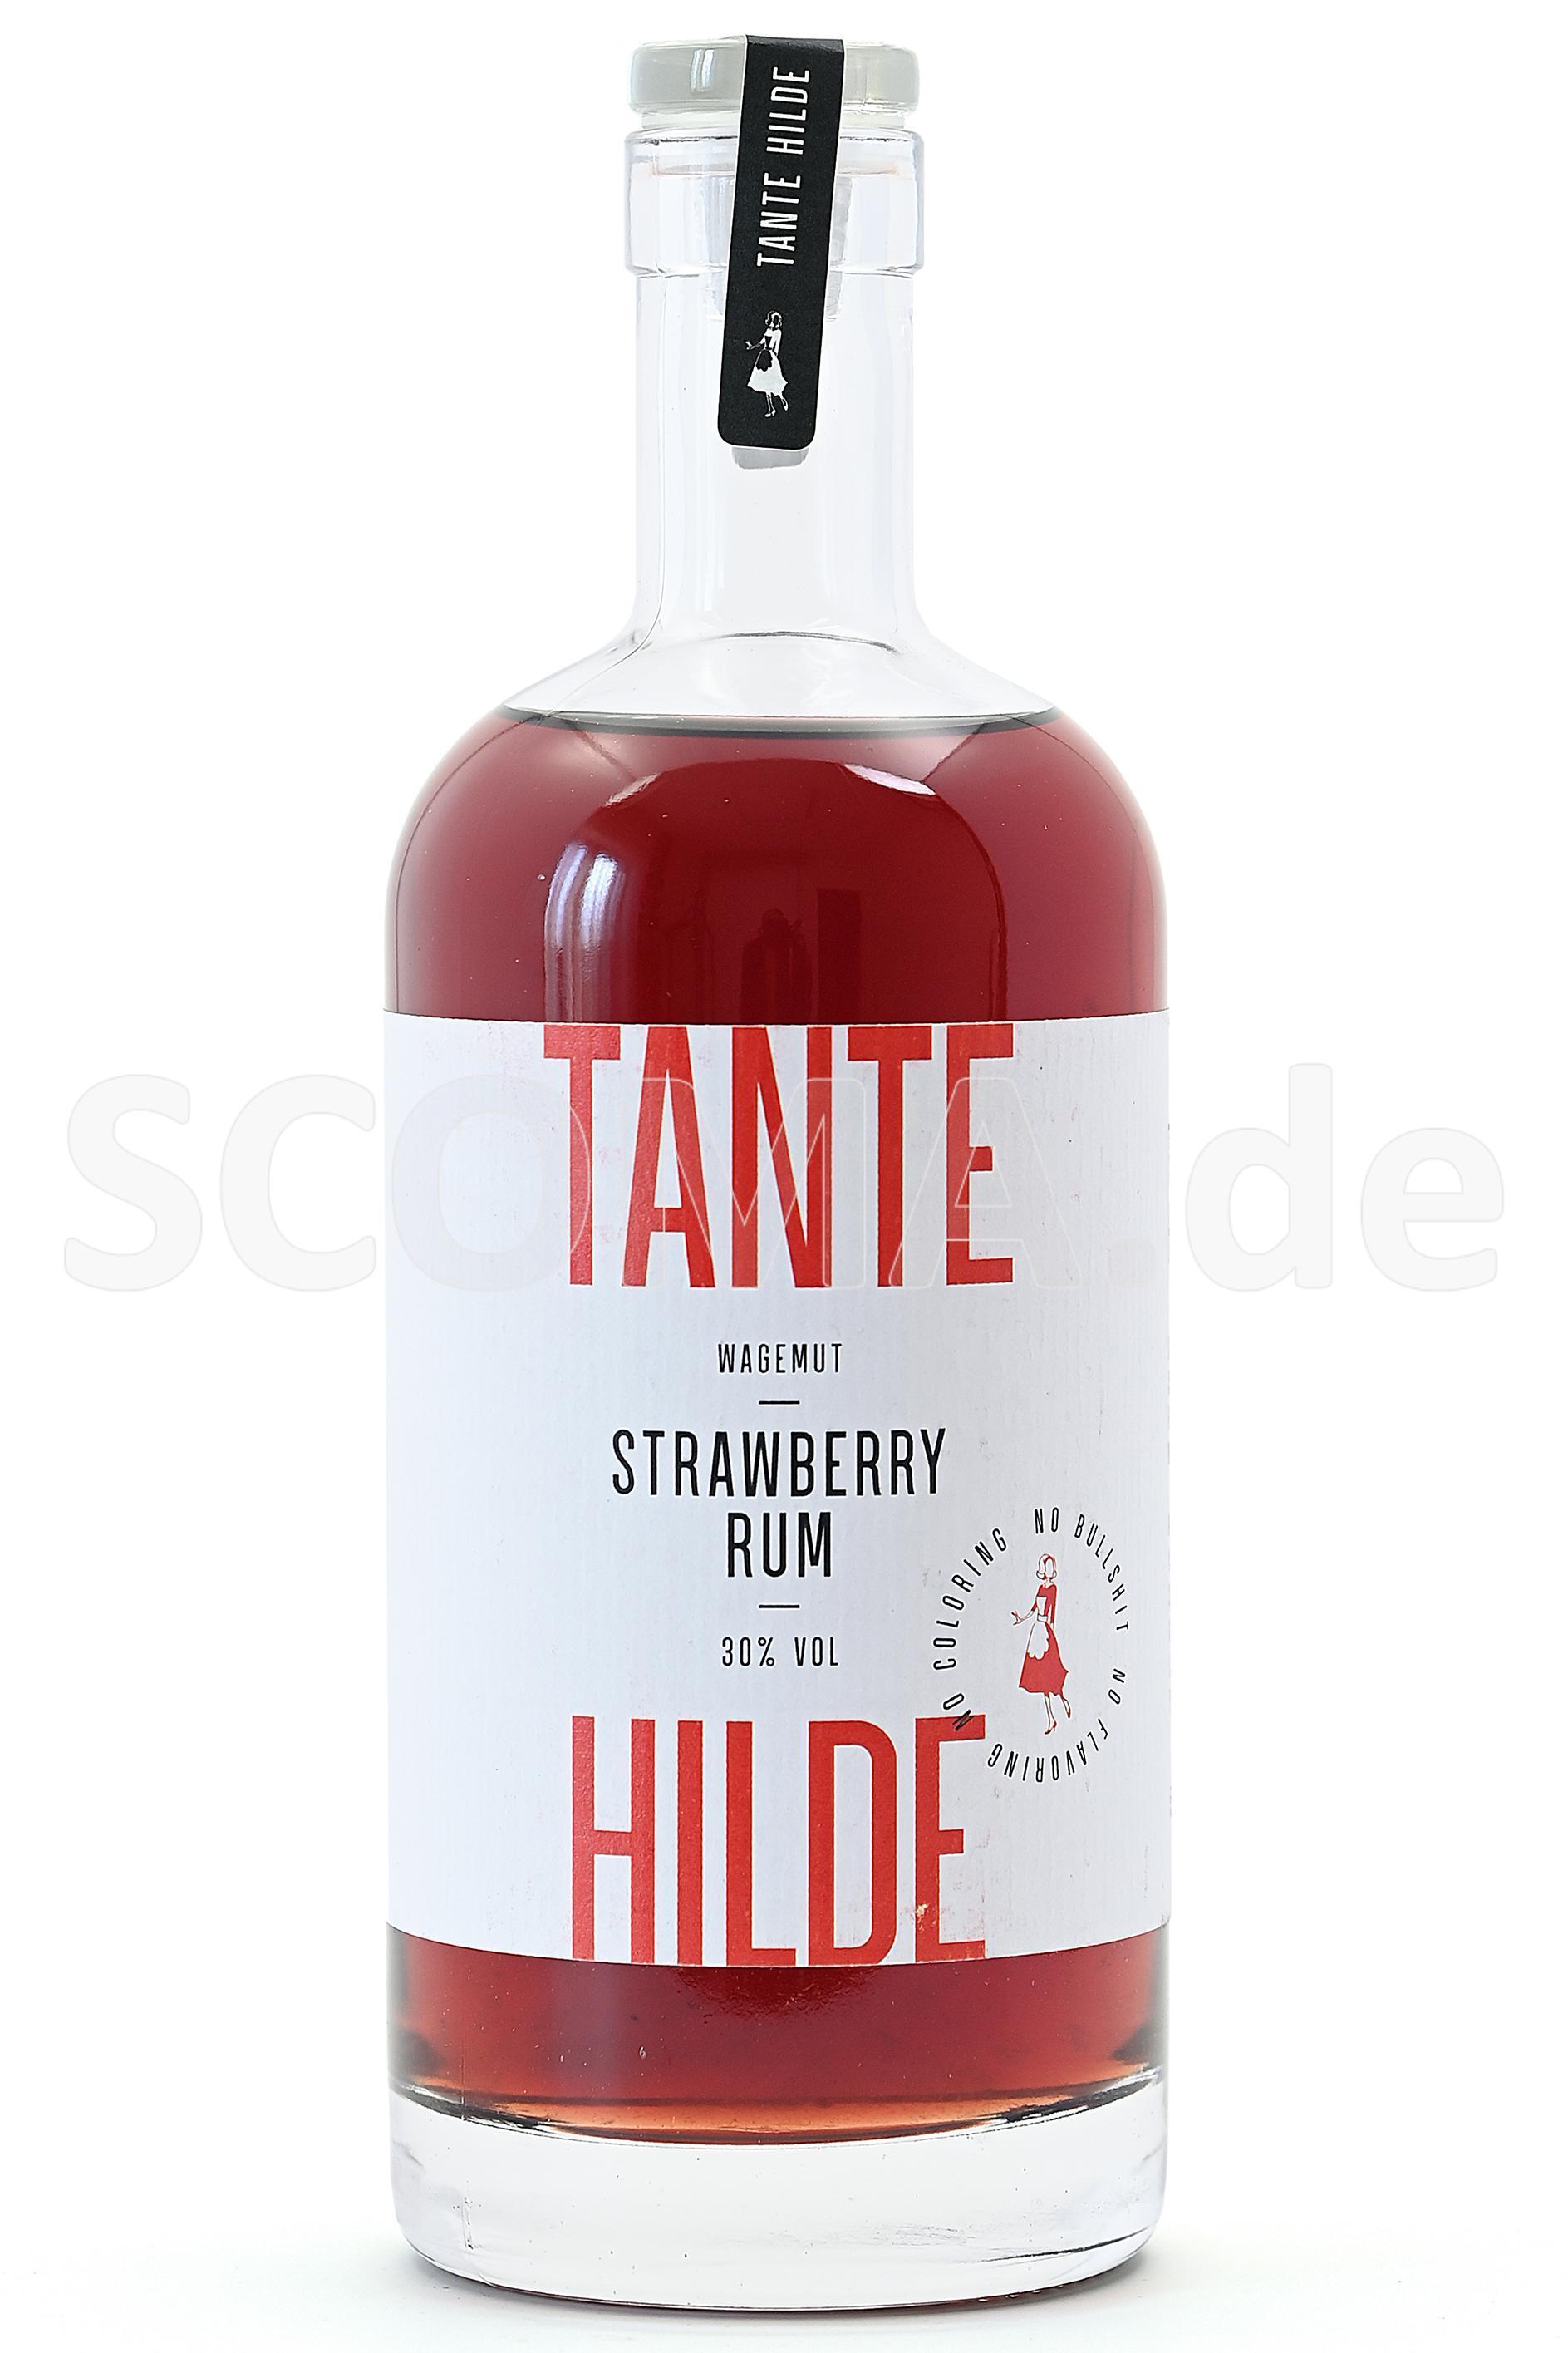 Tante Hilde Strawberry Rum